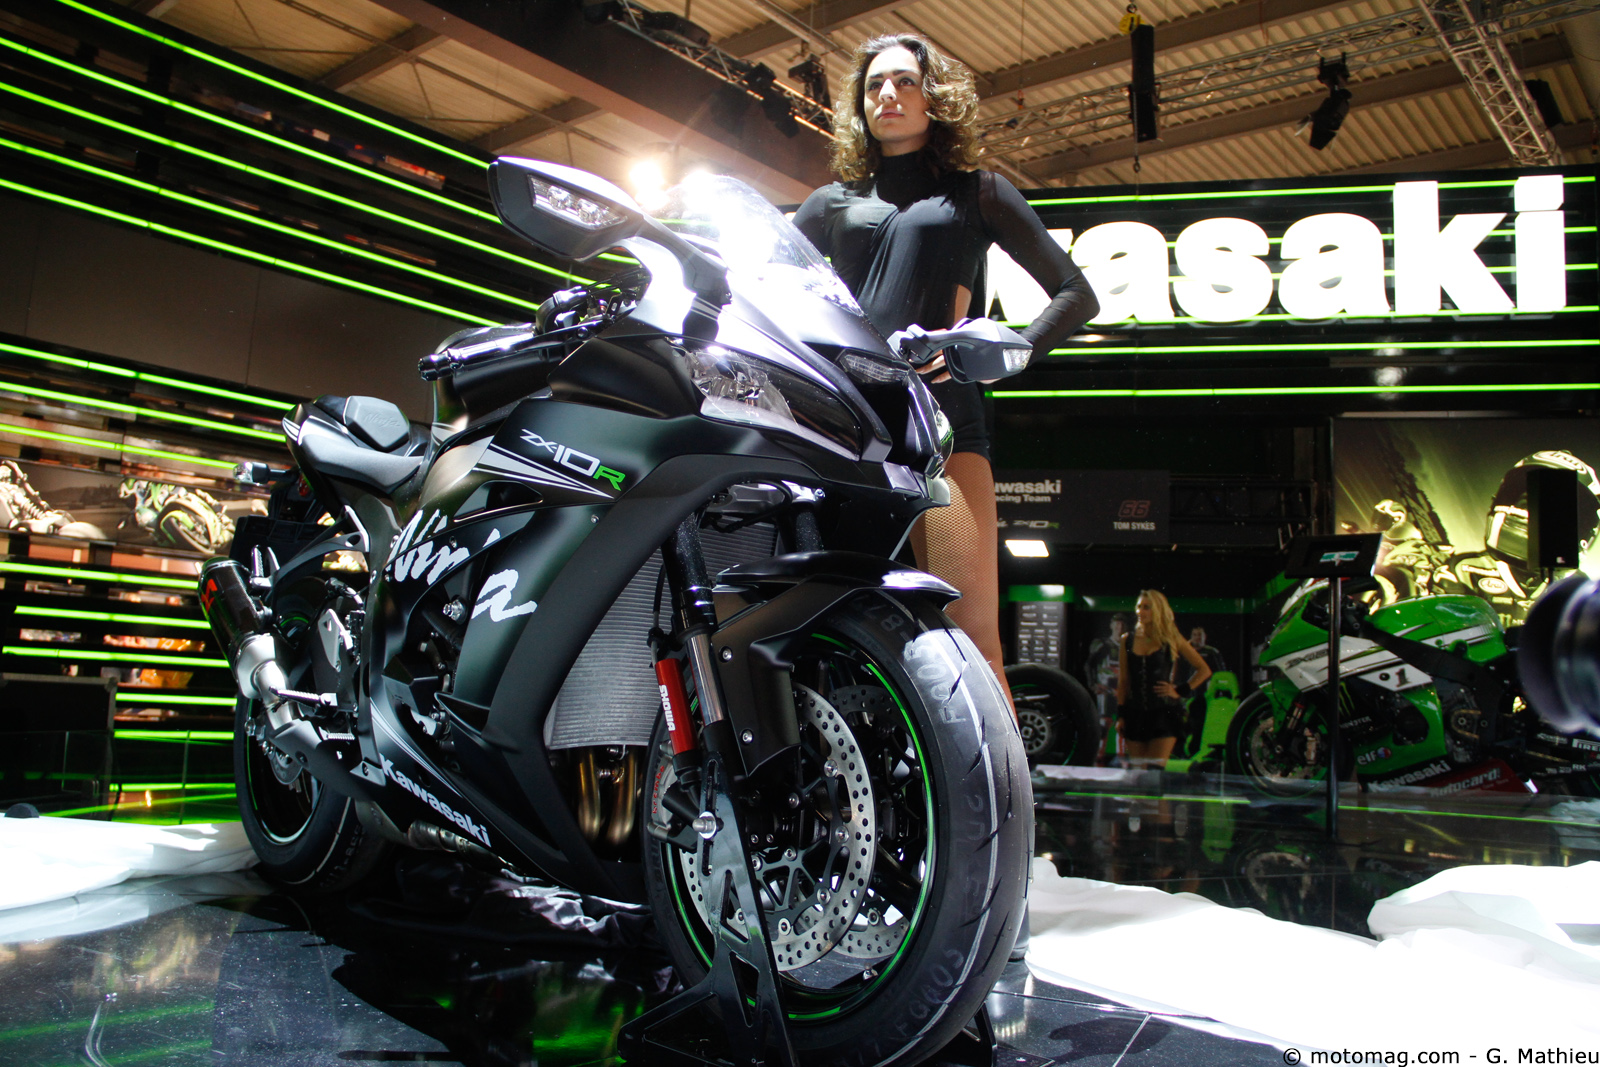 nouveaut moto 2016 la kawasaki zx 10r pr sent e moto magazine leader de l. Black Bedroom Furniture Sets. Home Design Ideas